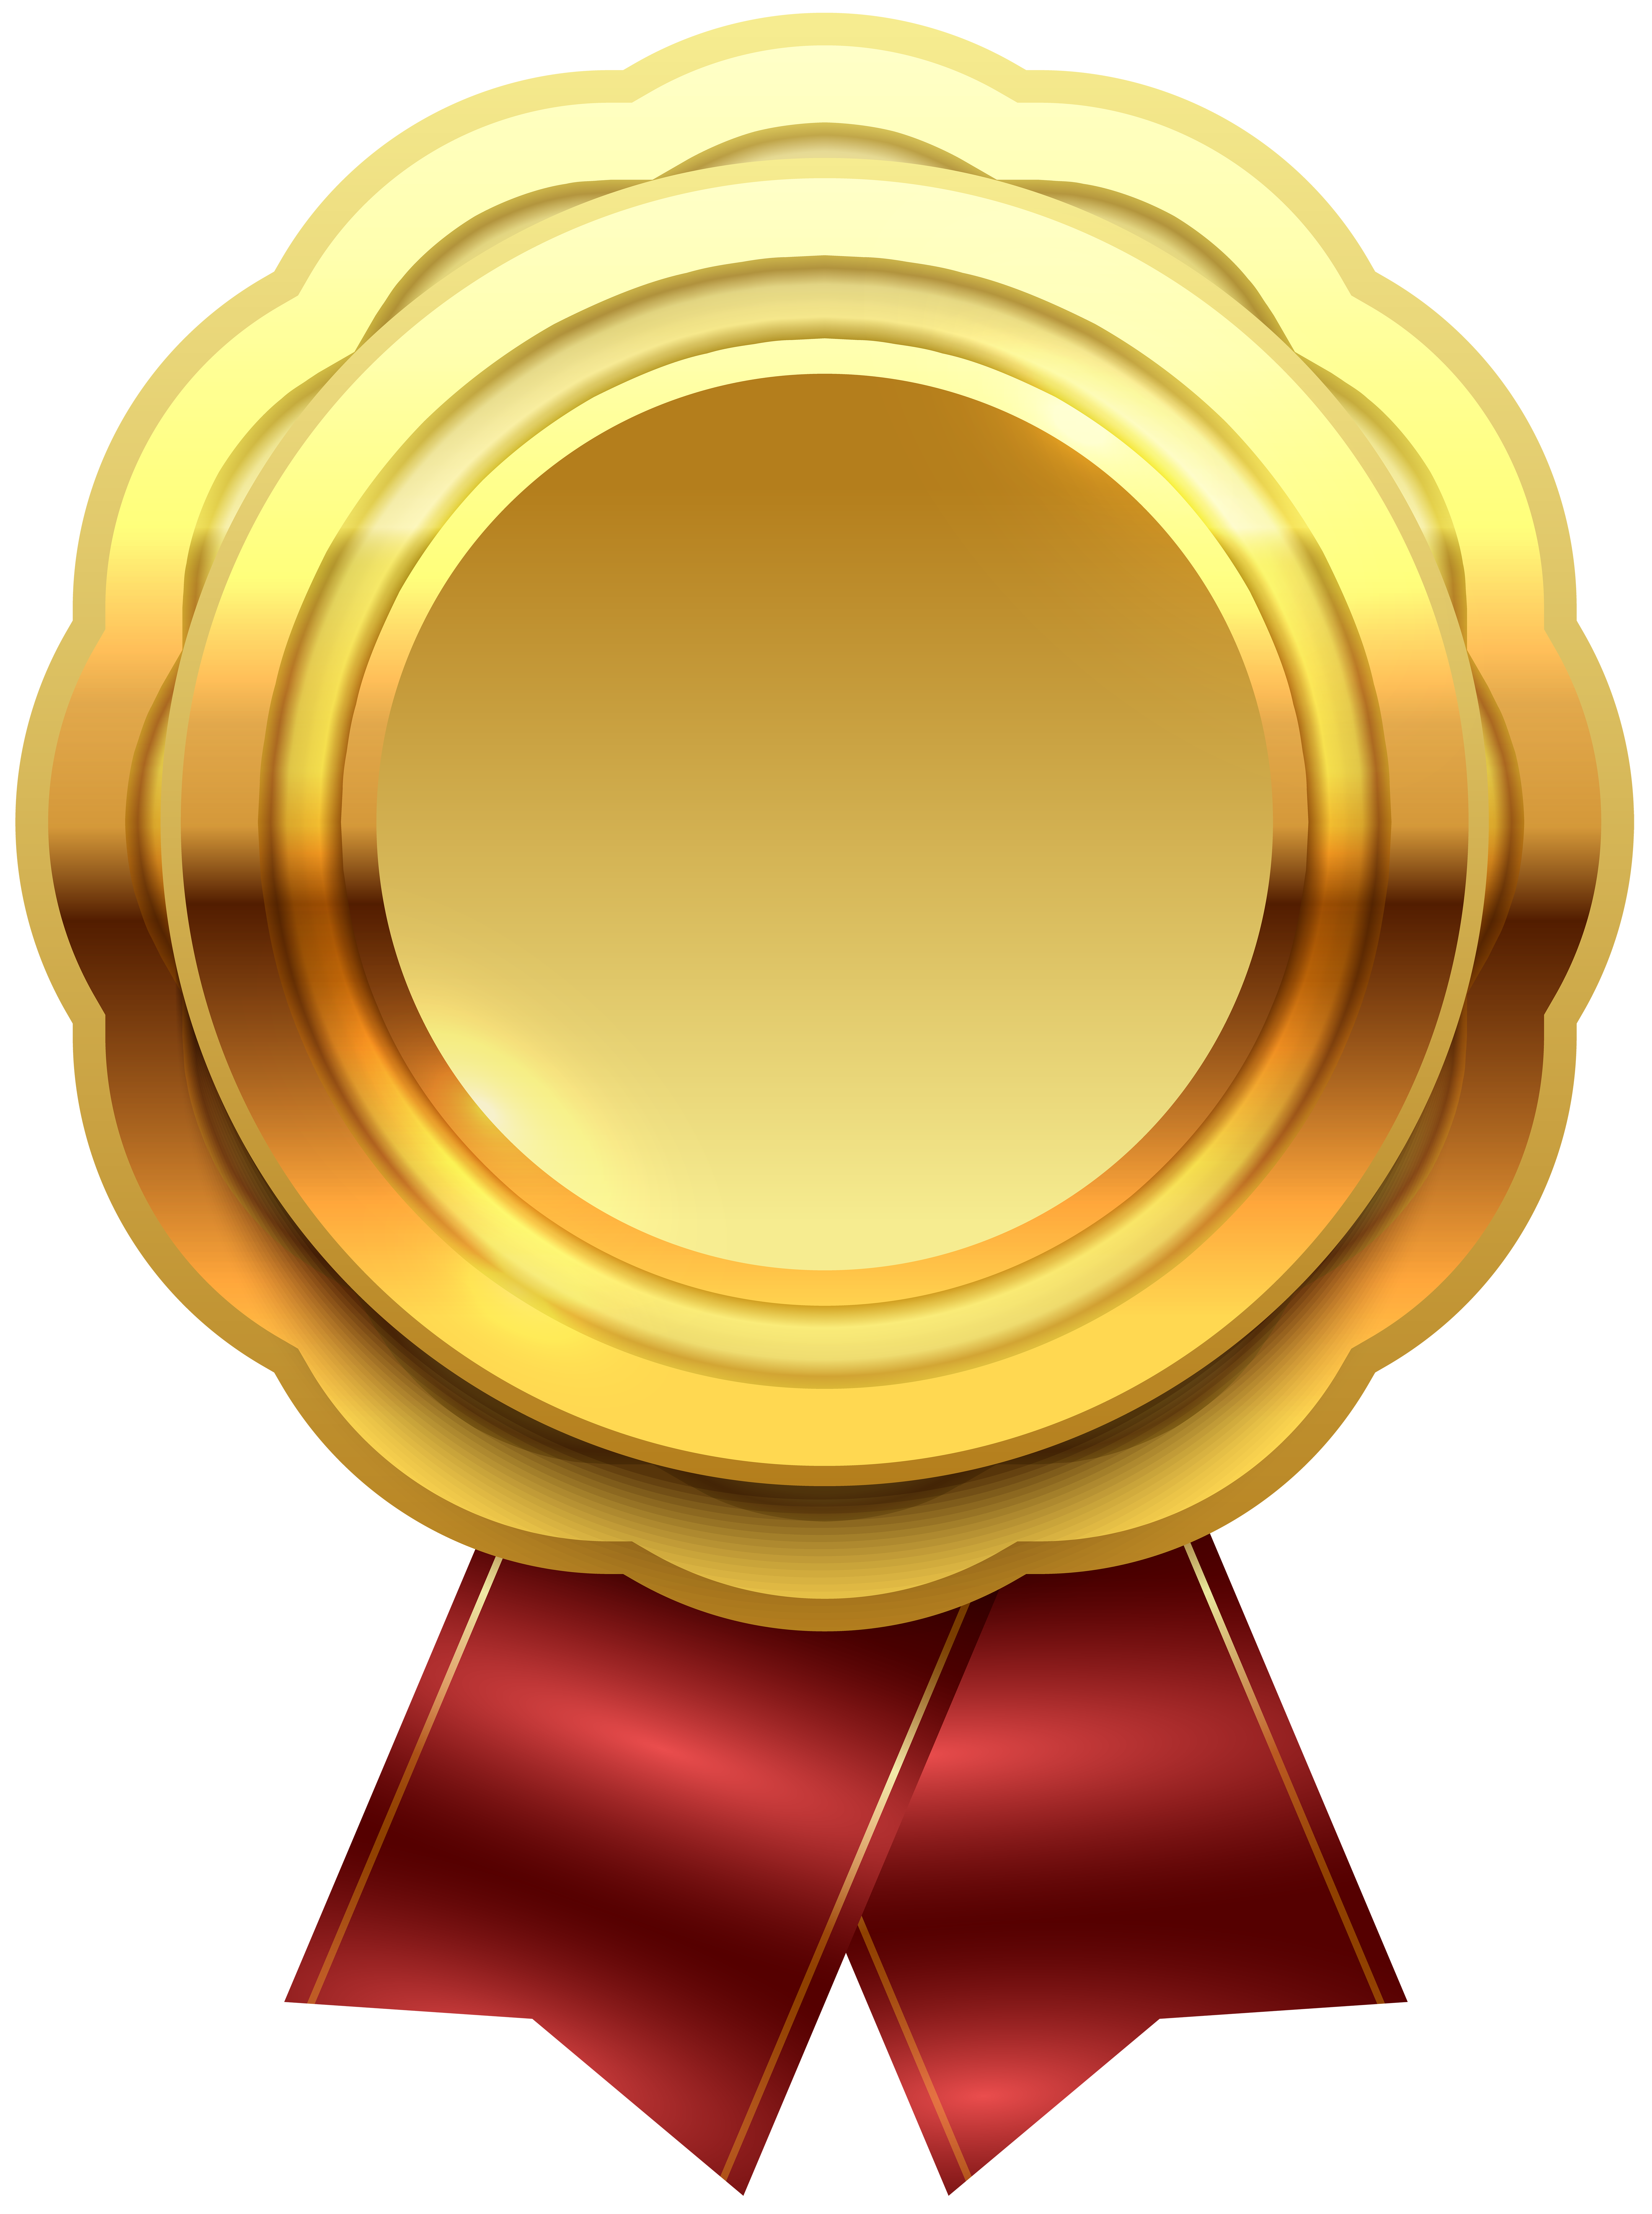 Gold Seal Clip Art PNG Image.